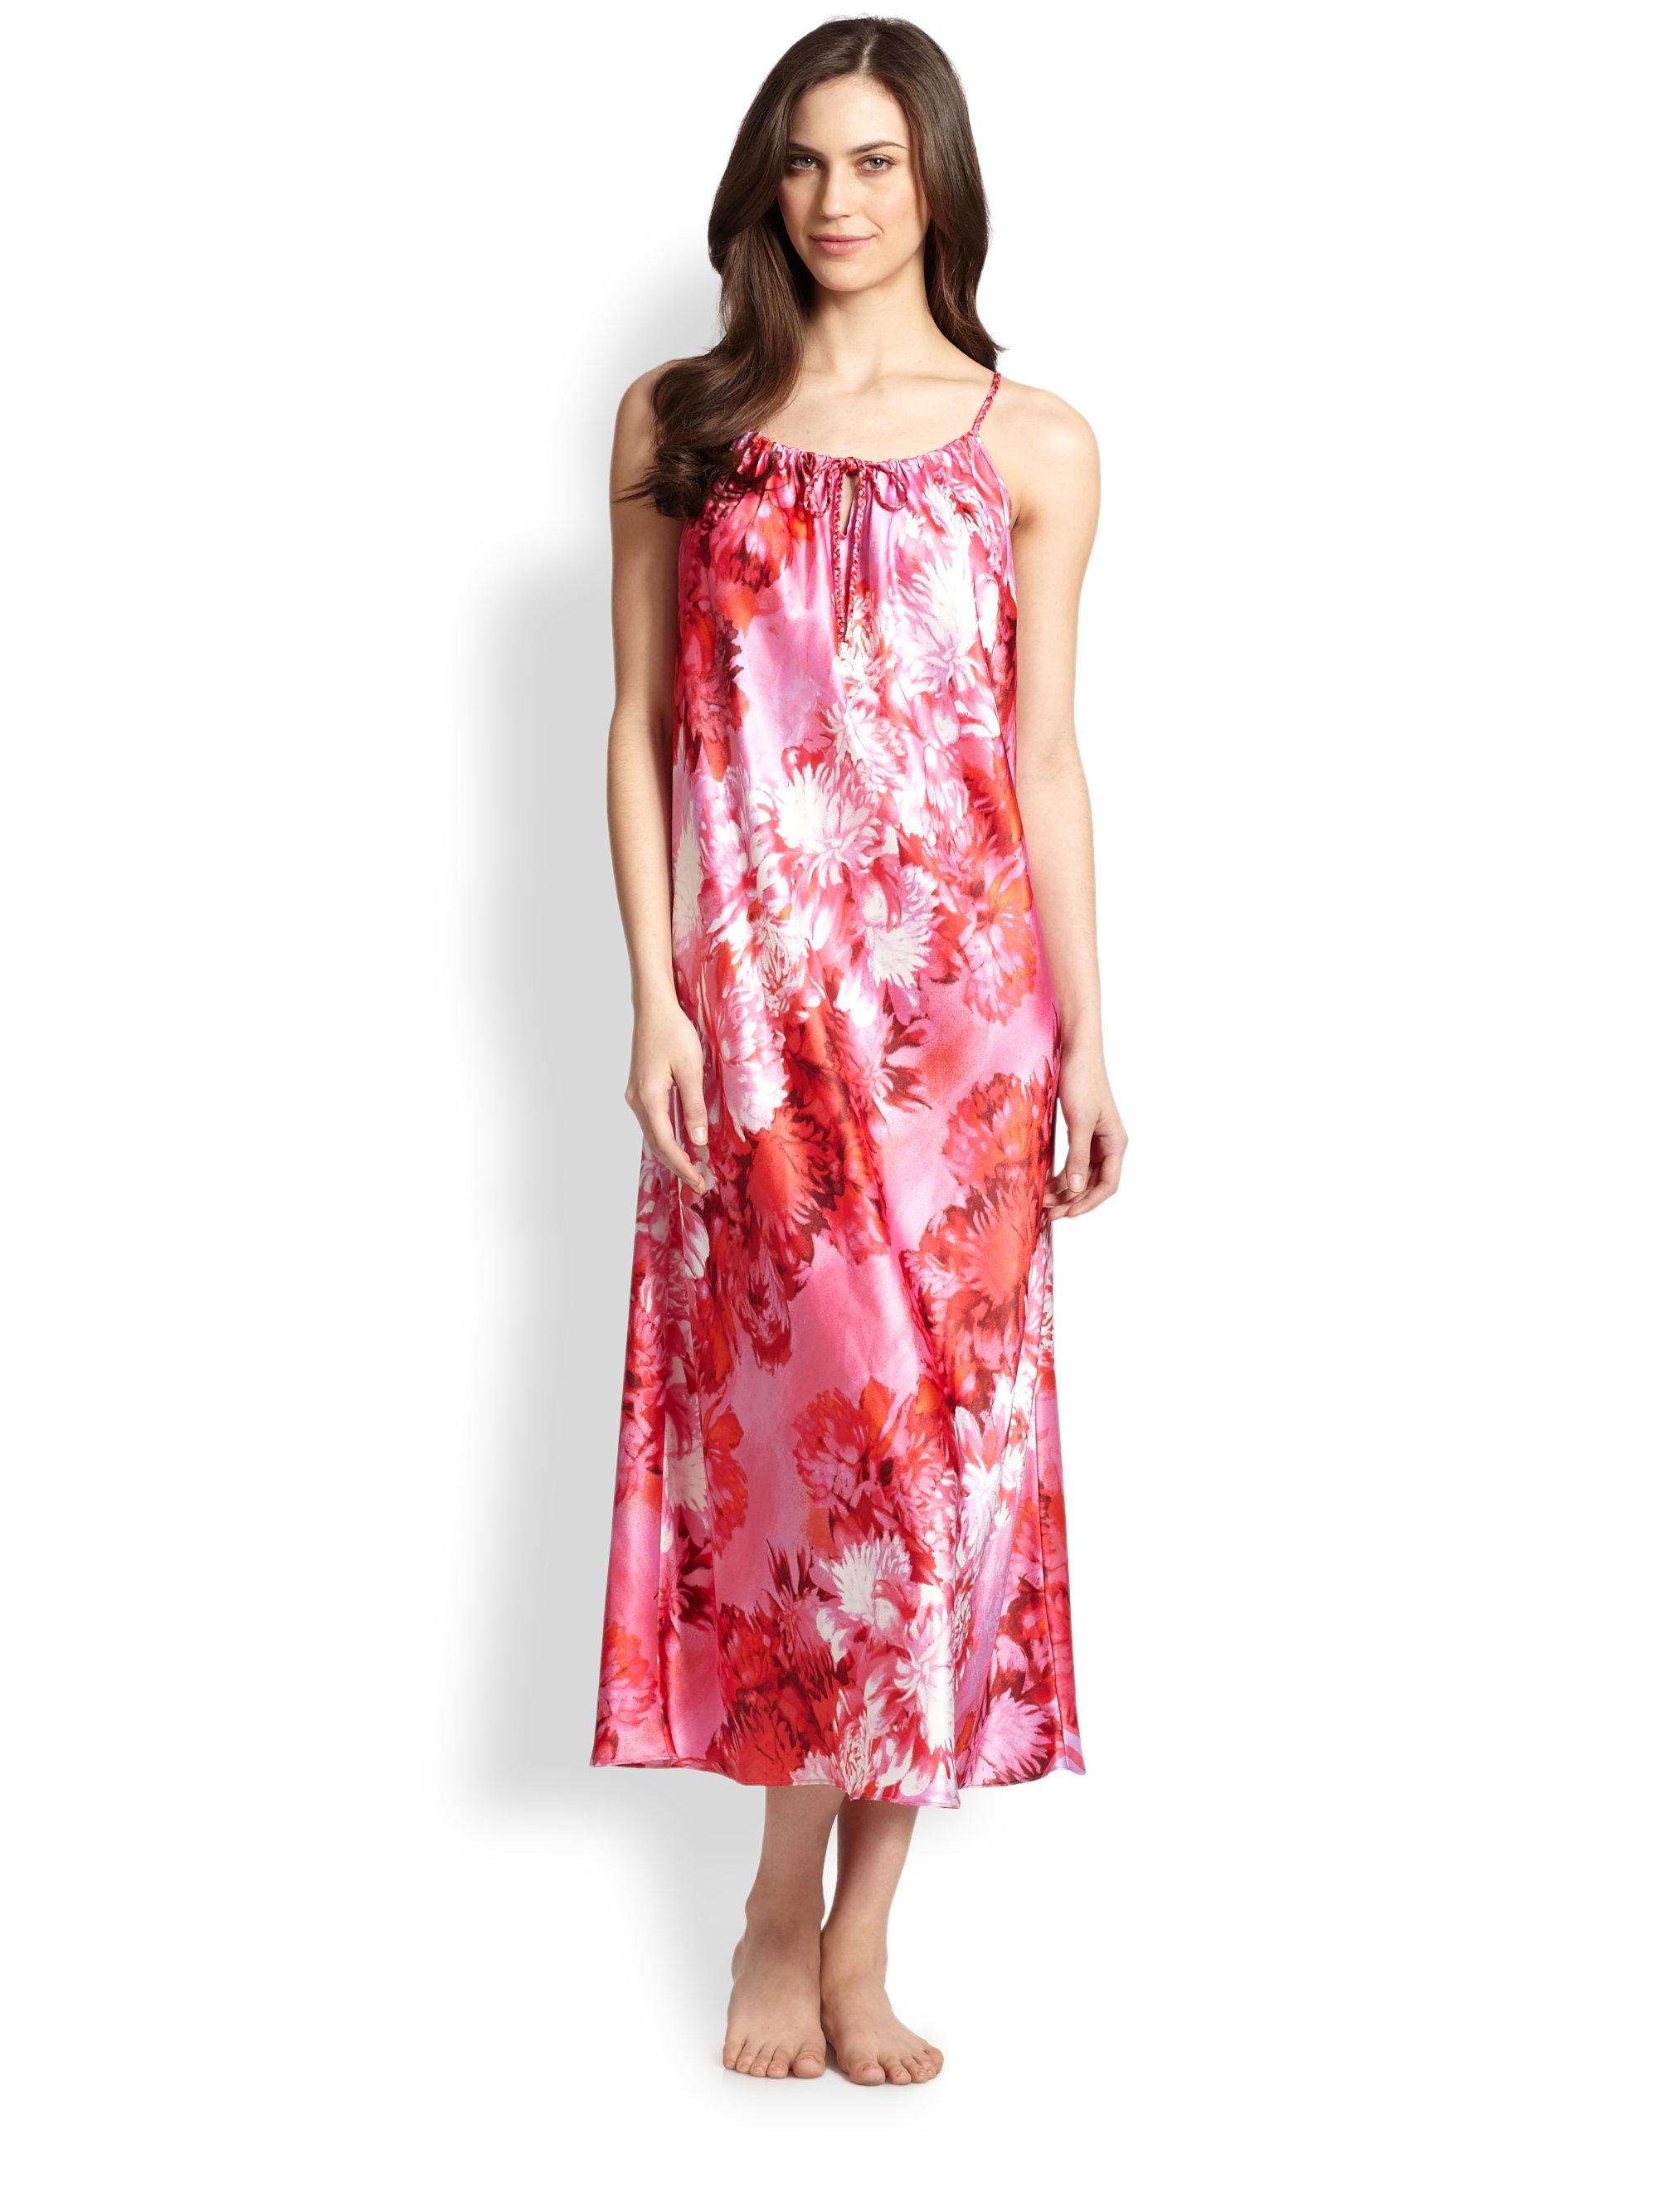 Lyst - Oscar de la Renta Floral-Print Polyester Satin Nightgown in Red 300dc7efc